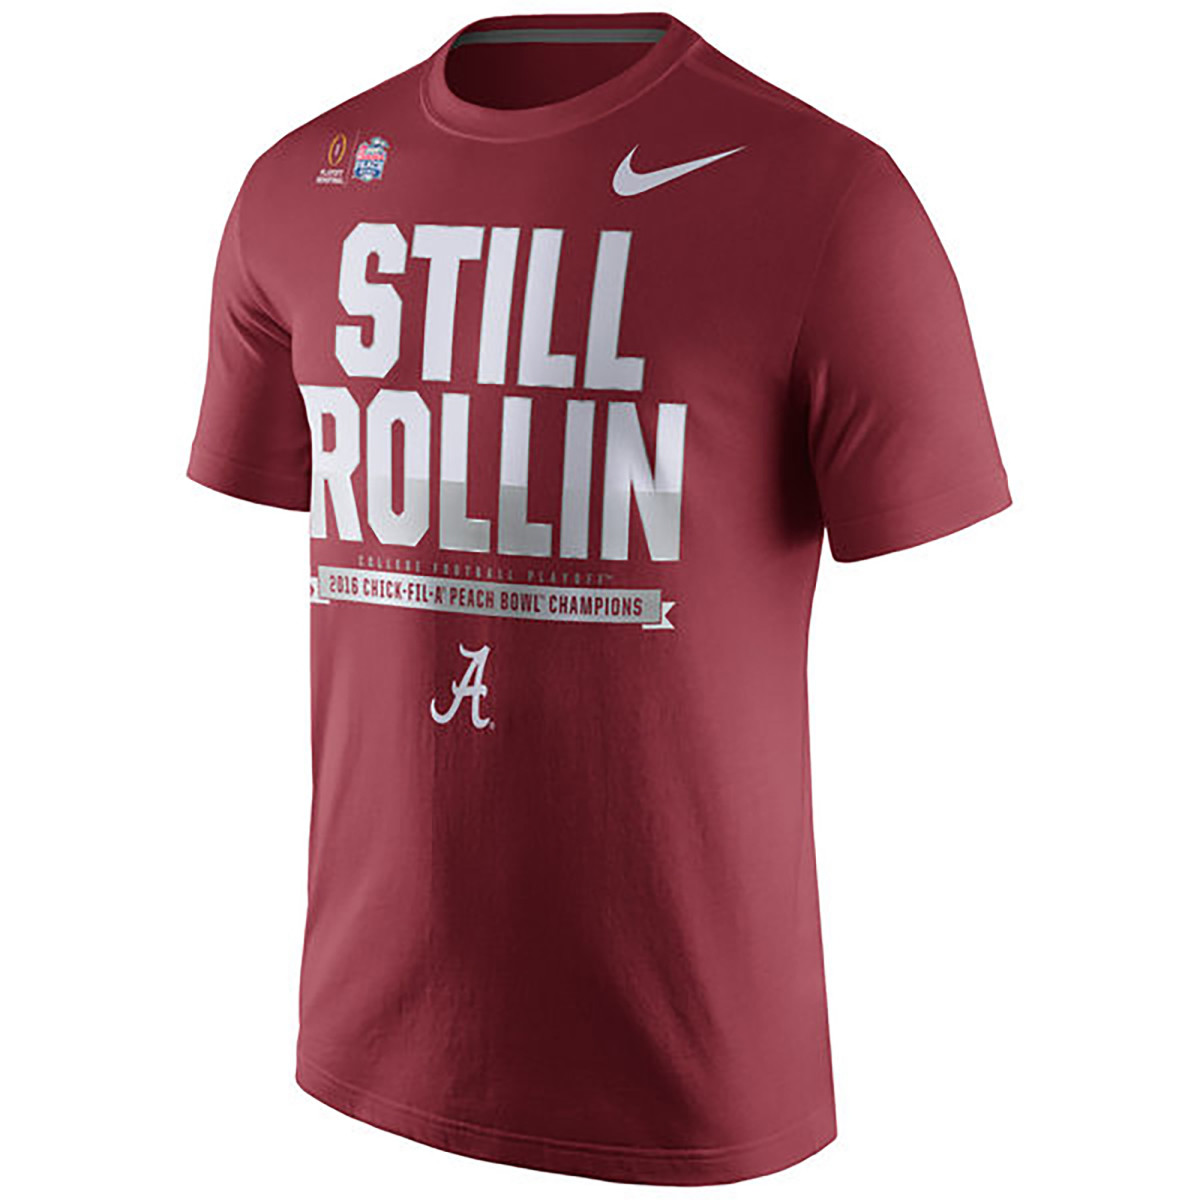 alabama-still-rollin-shirt.jpg